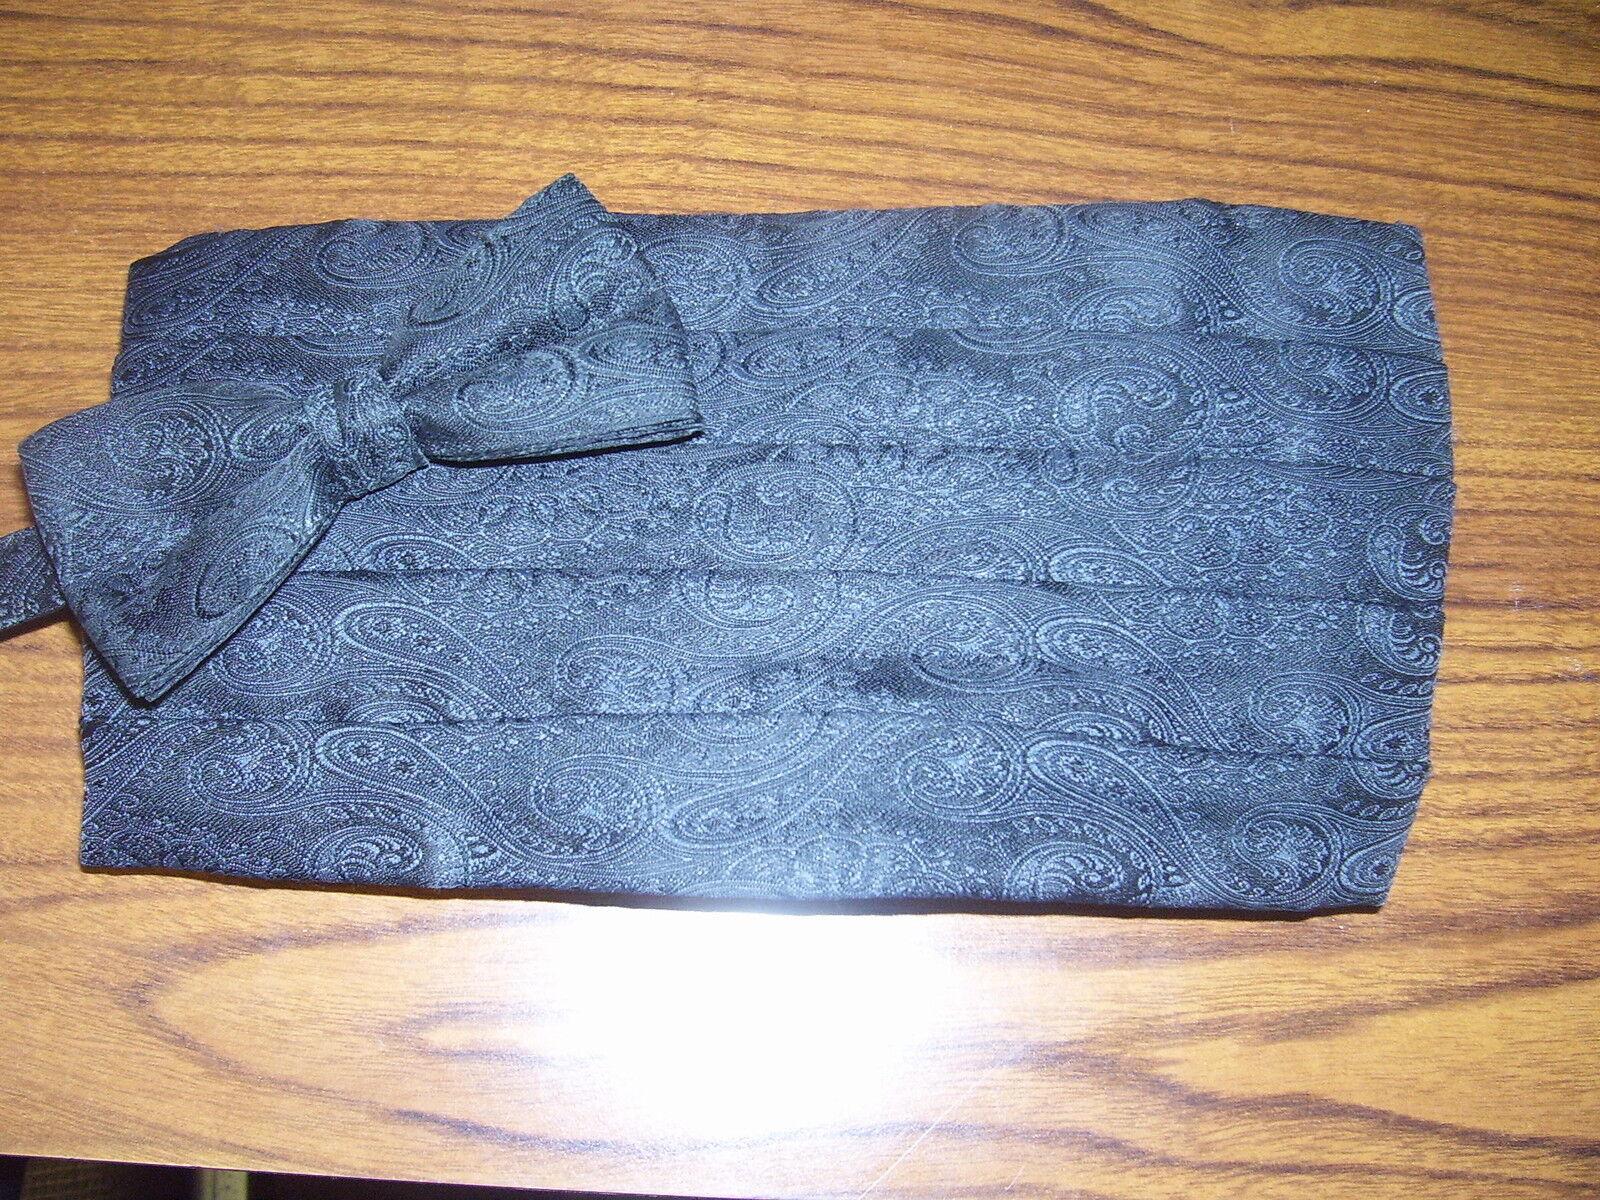 Used Cummerbund & Bow Tie - Black Paisley 88830